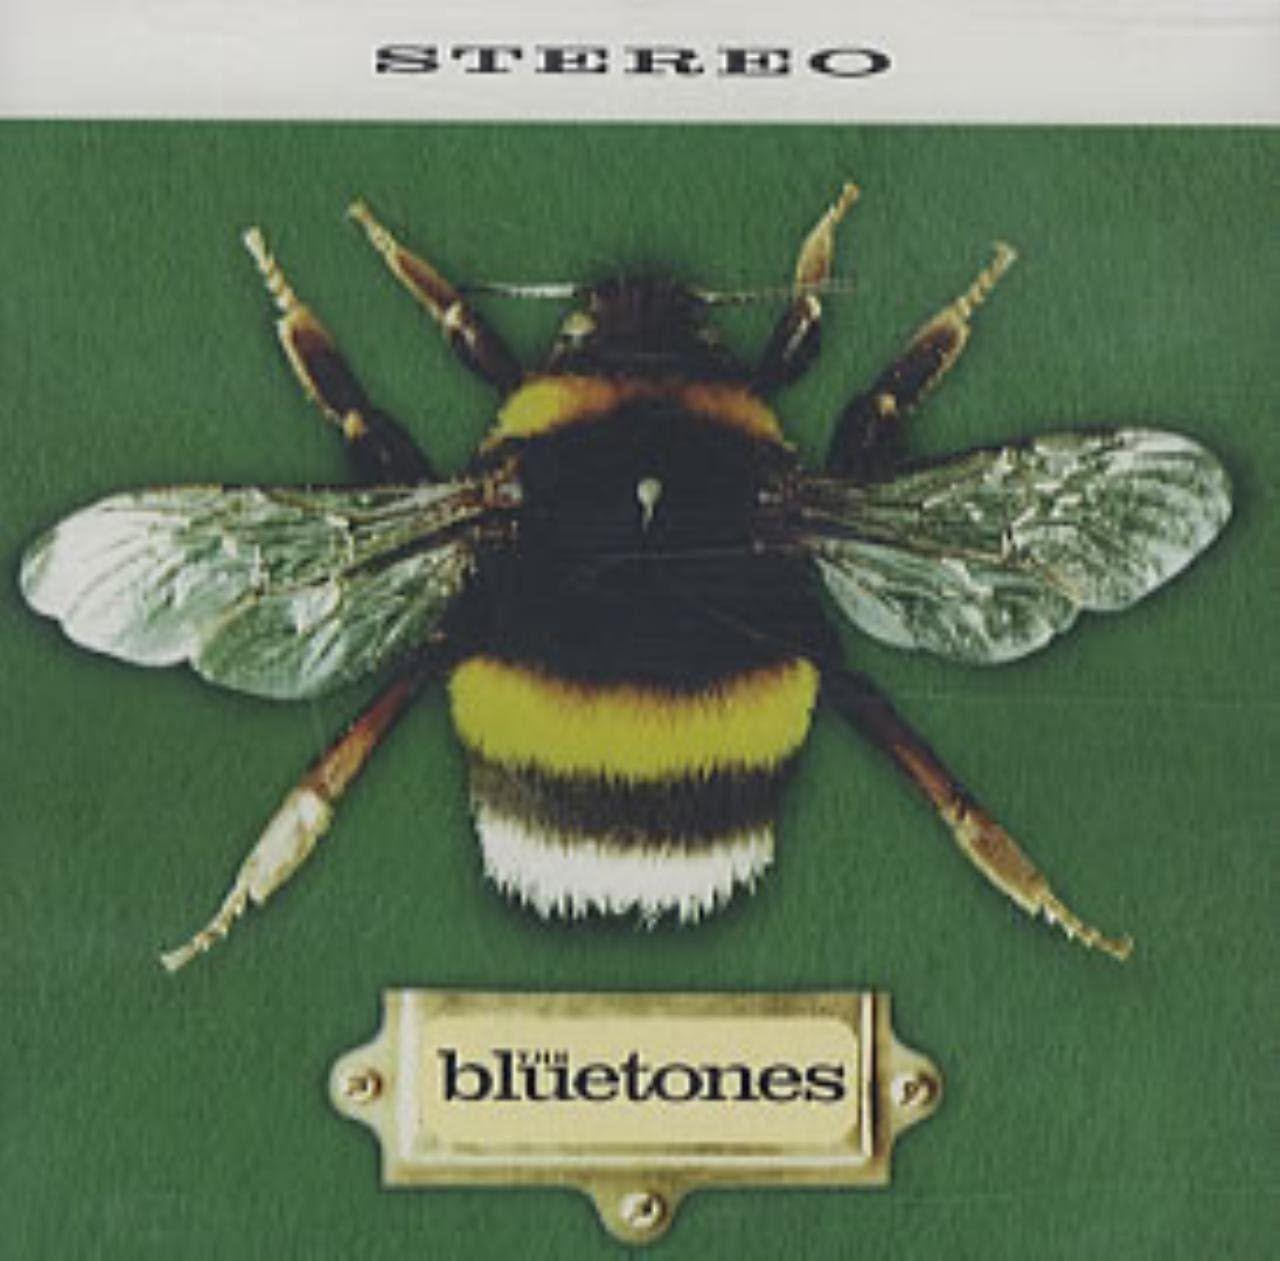 The Bluetones | Slight Return 솔루션을 찾을 수 없다고 발랄깜찍하게 노래하지 말란 말이얌 ㅠㅠ